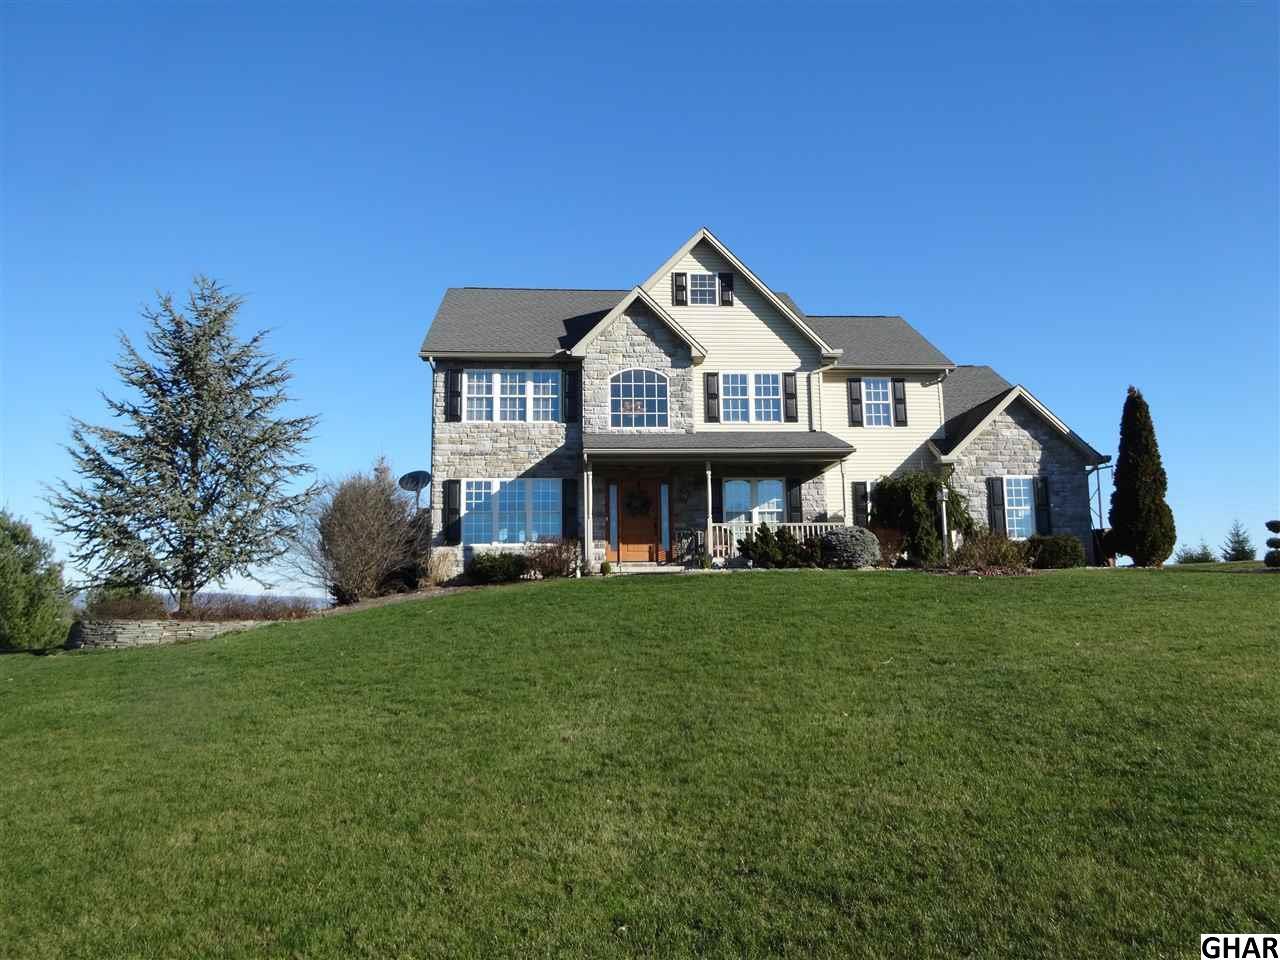 Real Estate for Sale, ListingId: 36753815, Shippensburg,PA17257